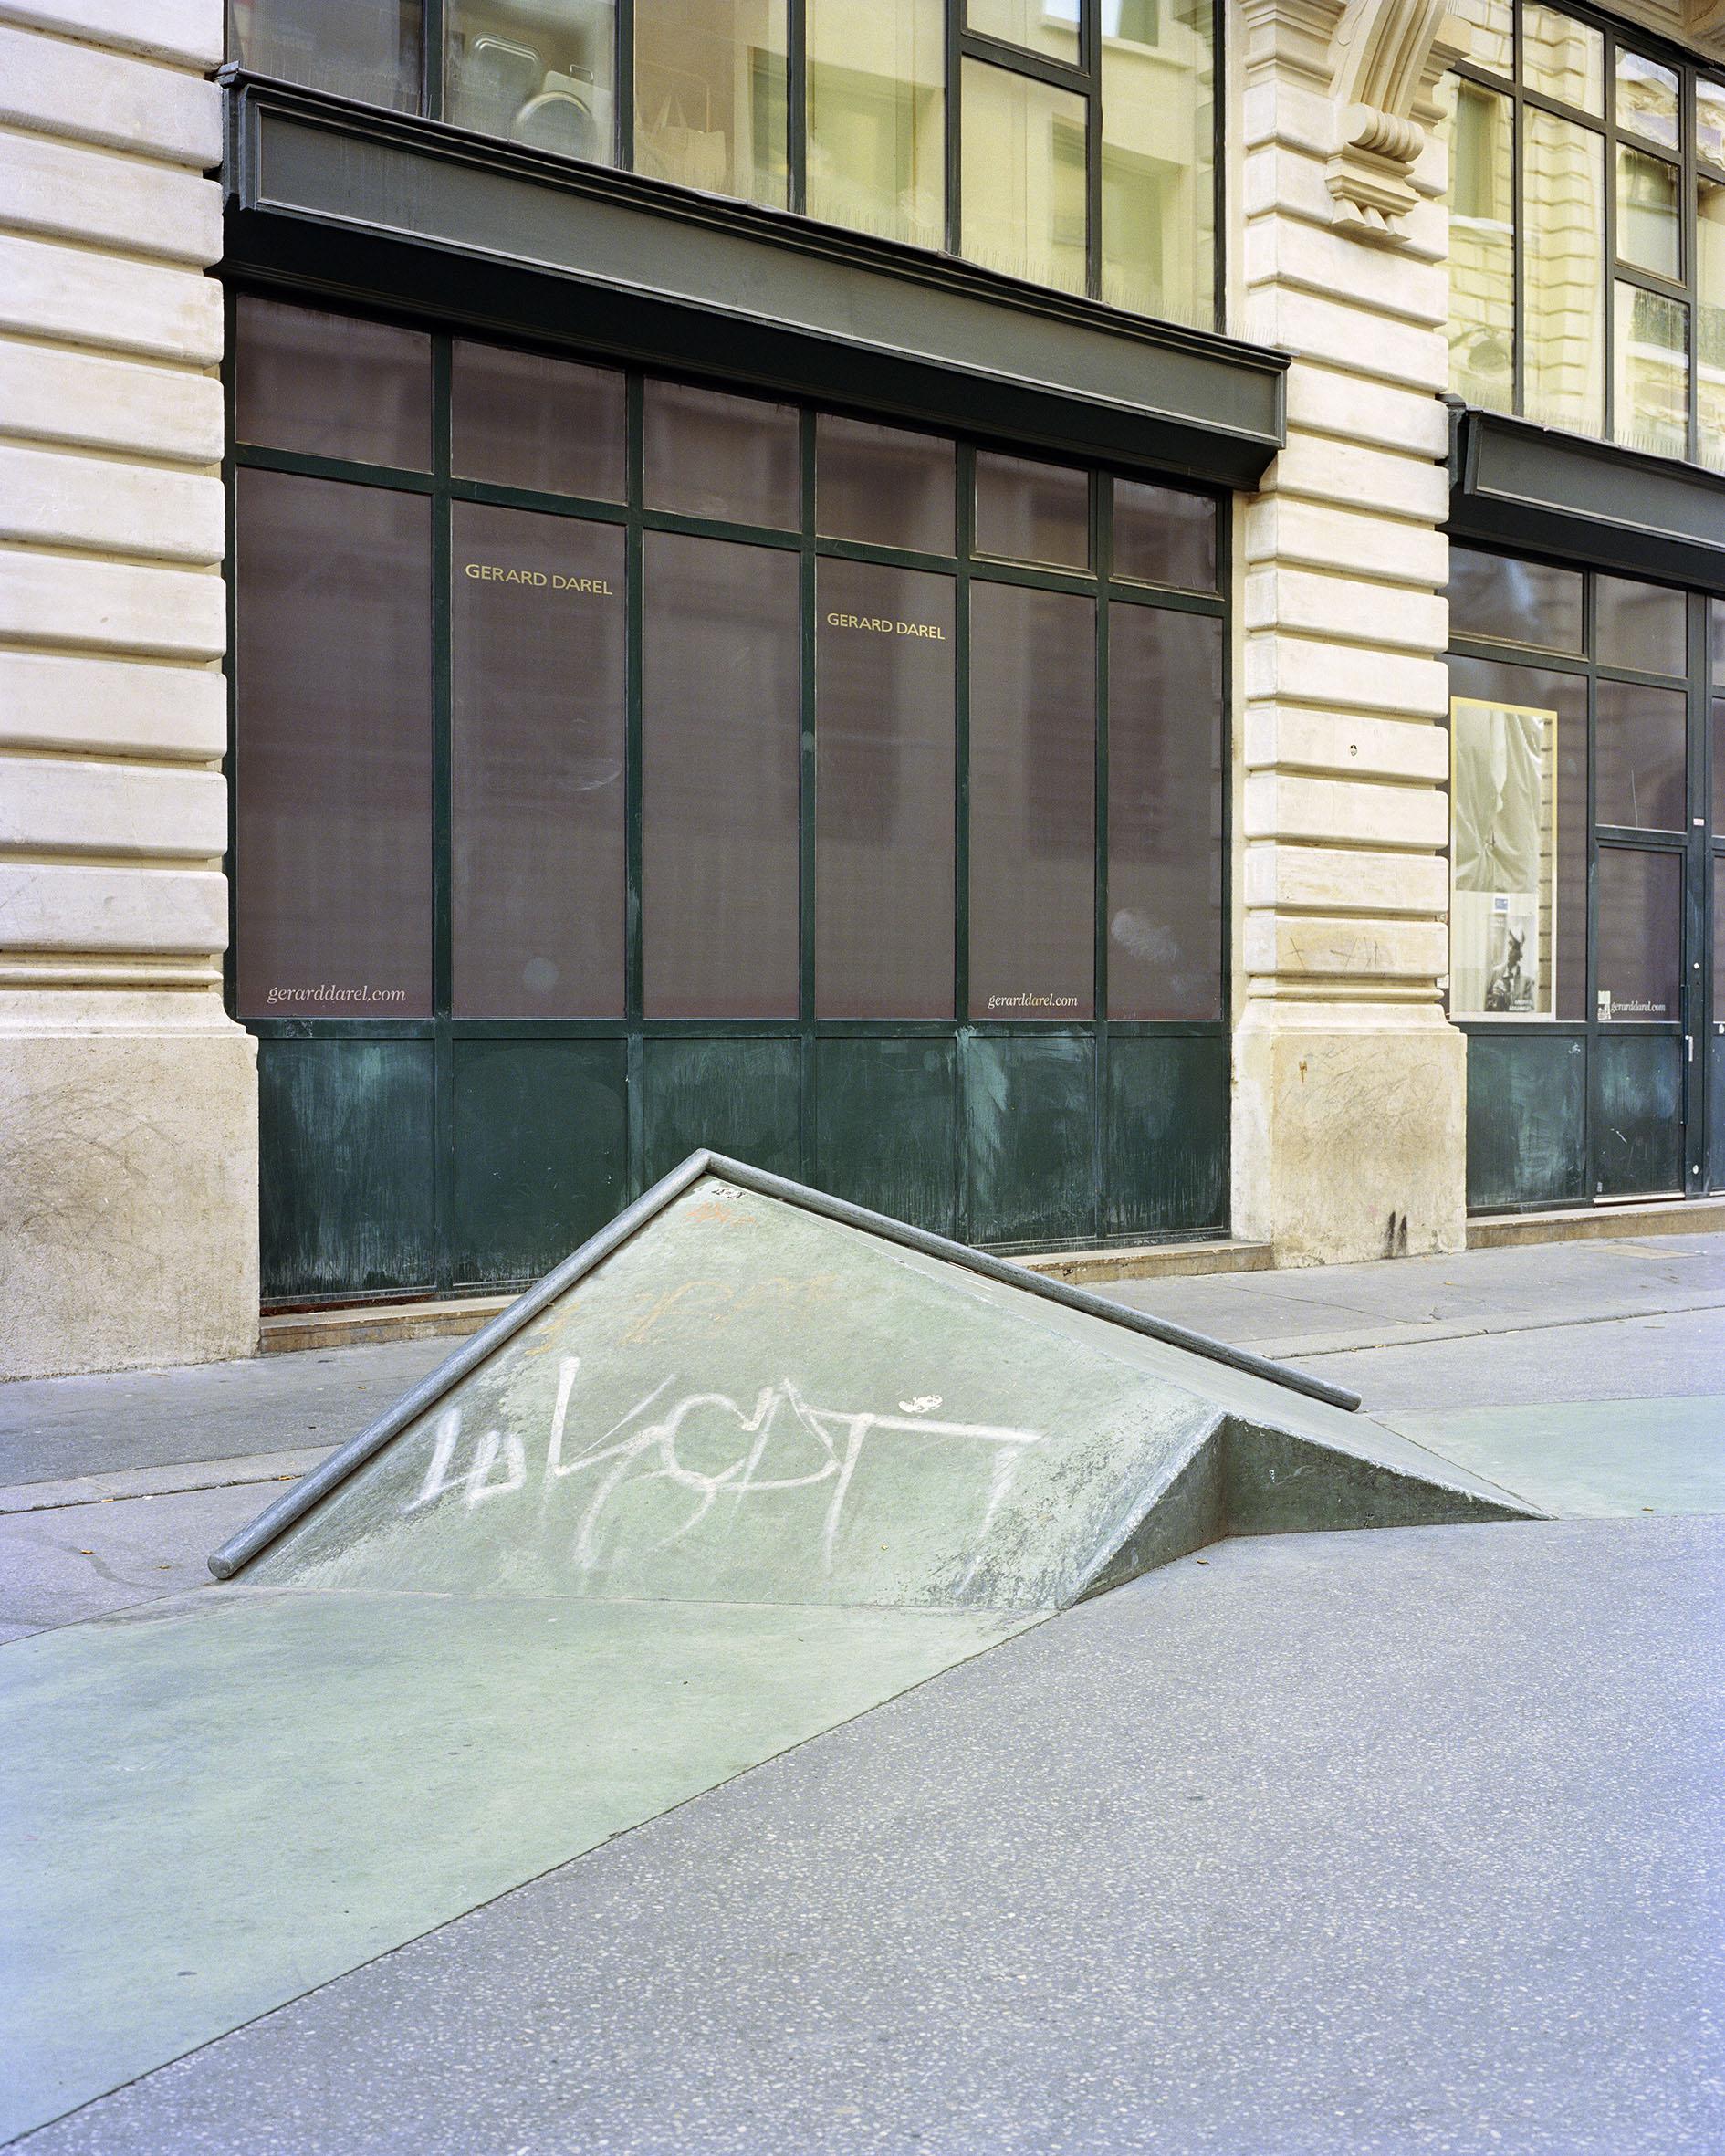 Skatepark rue Léon Cladel, Paris, Agence Constructo & Raphaël Zarka, 2012 (Photo Stéphane Ruchaud 2016)